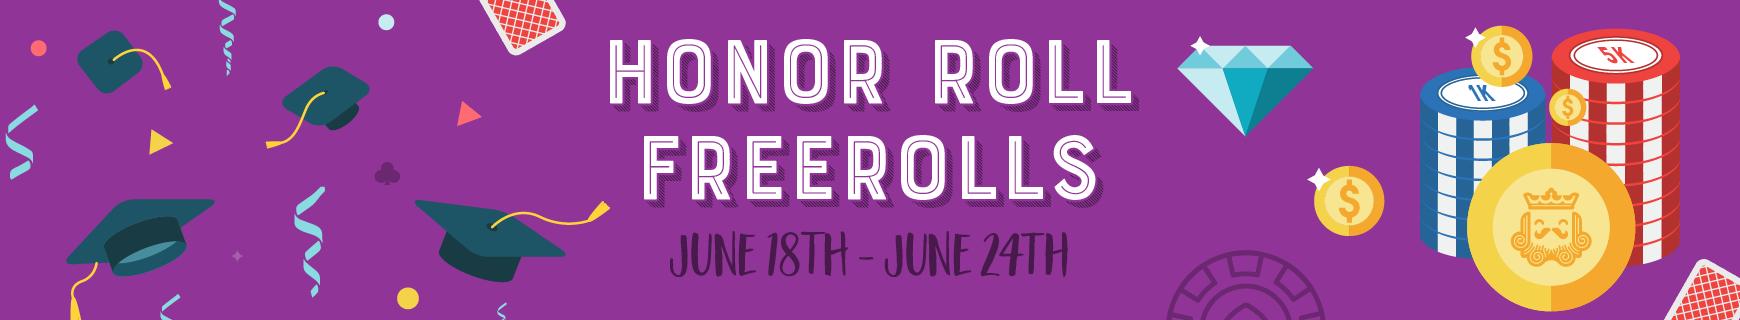 Honor roll freerolls %28870 x 160%29 2x